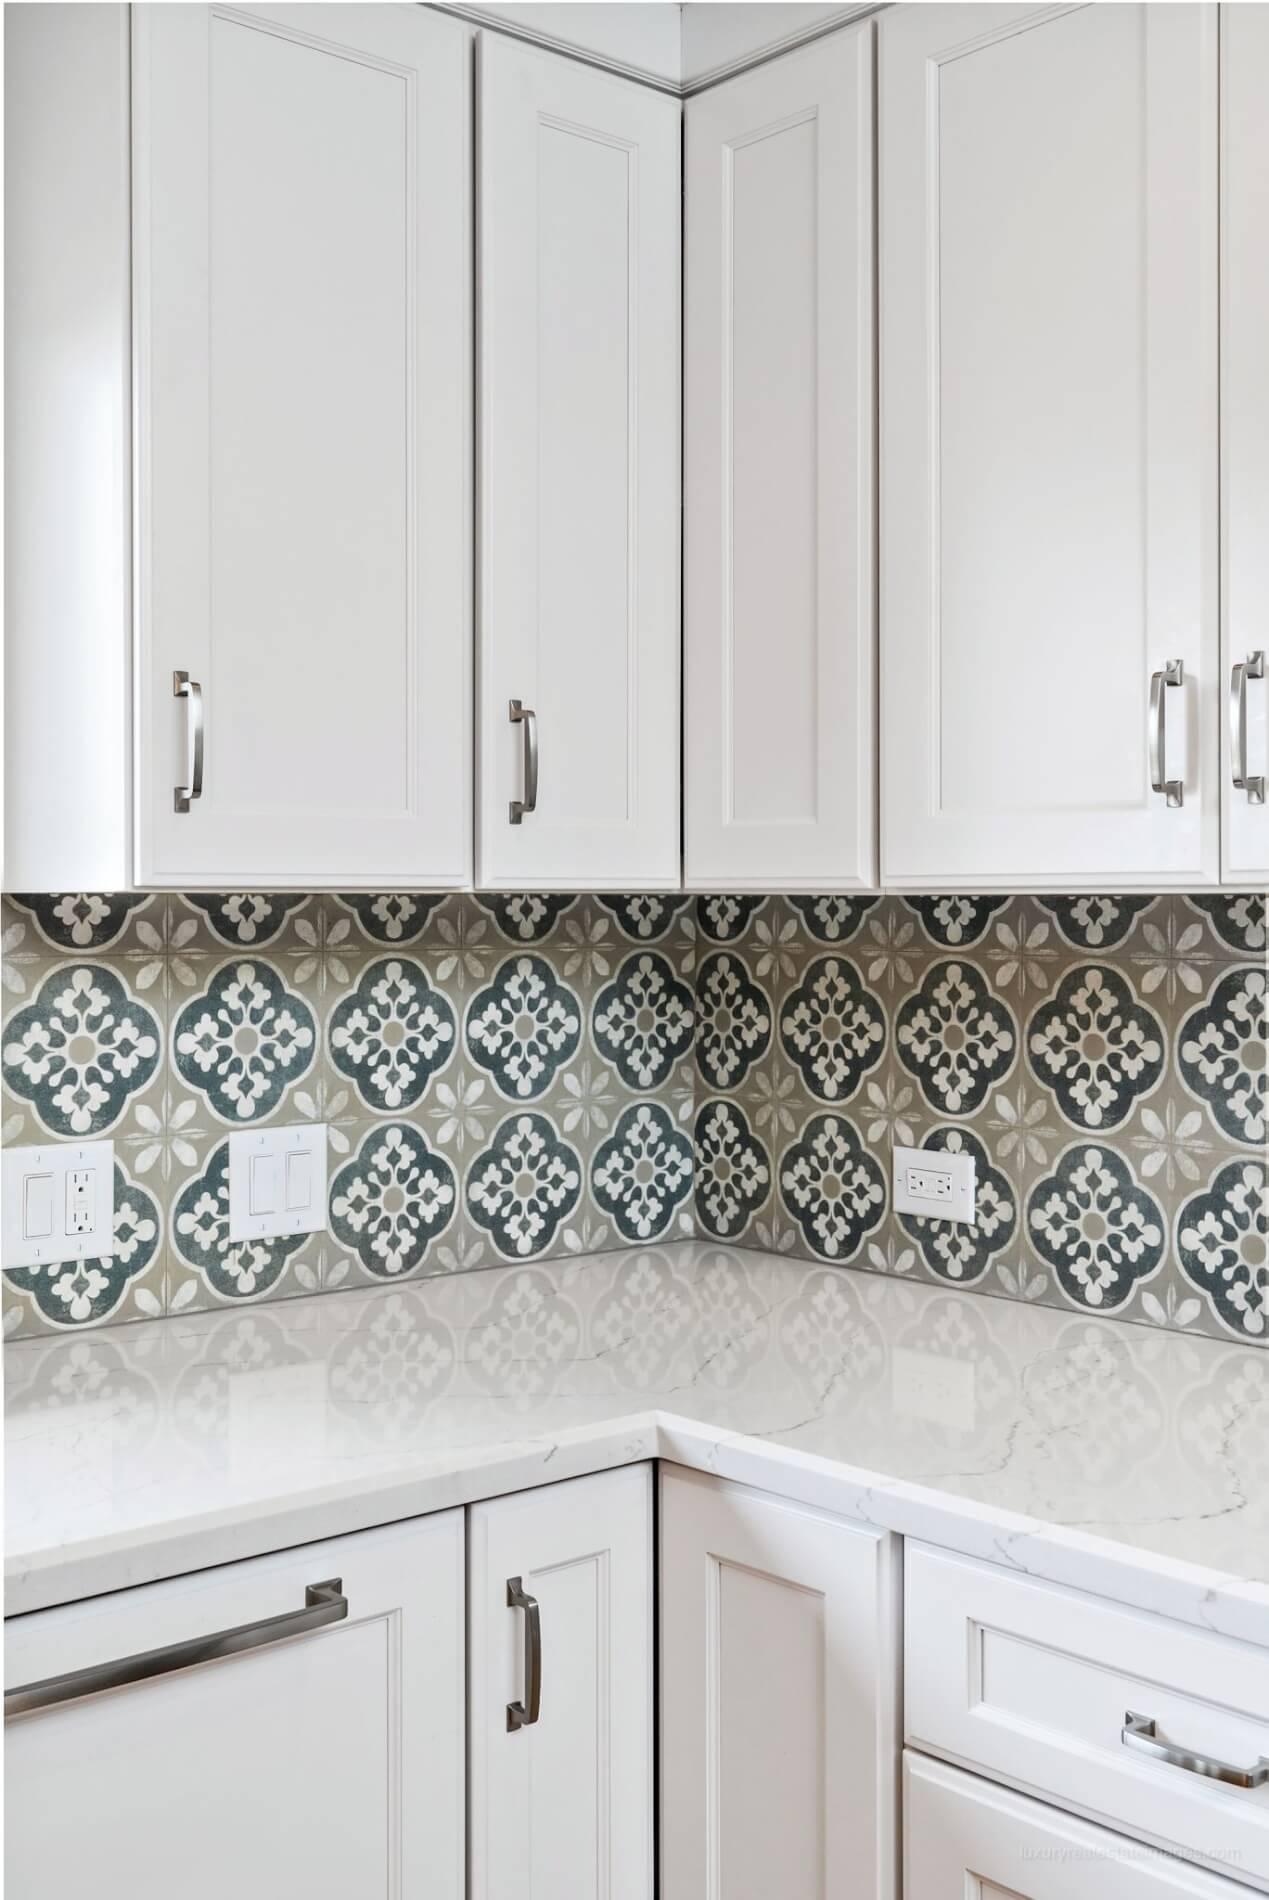 simple white kitchen with patterned backsplash